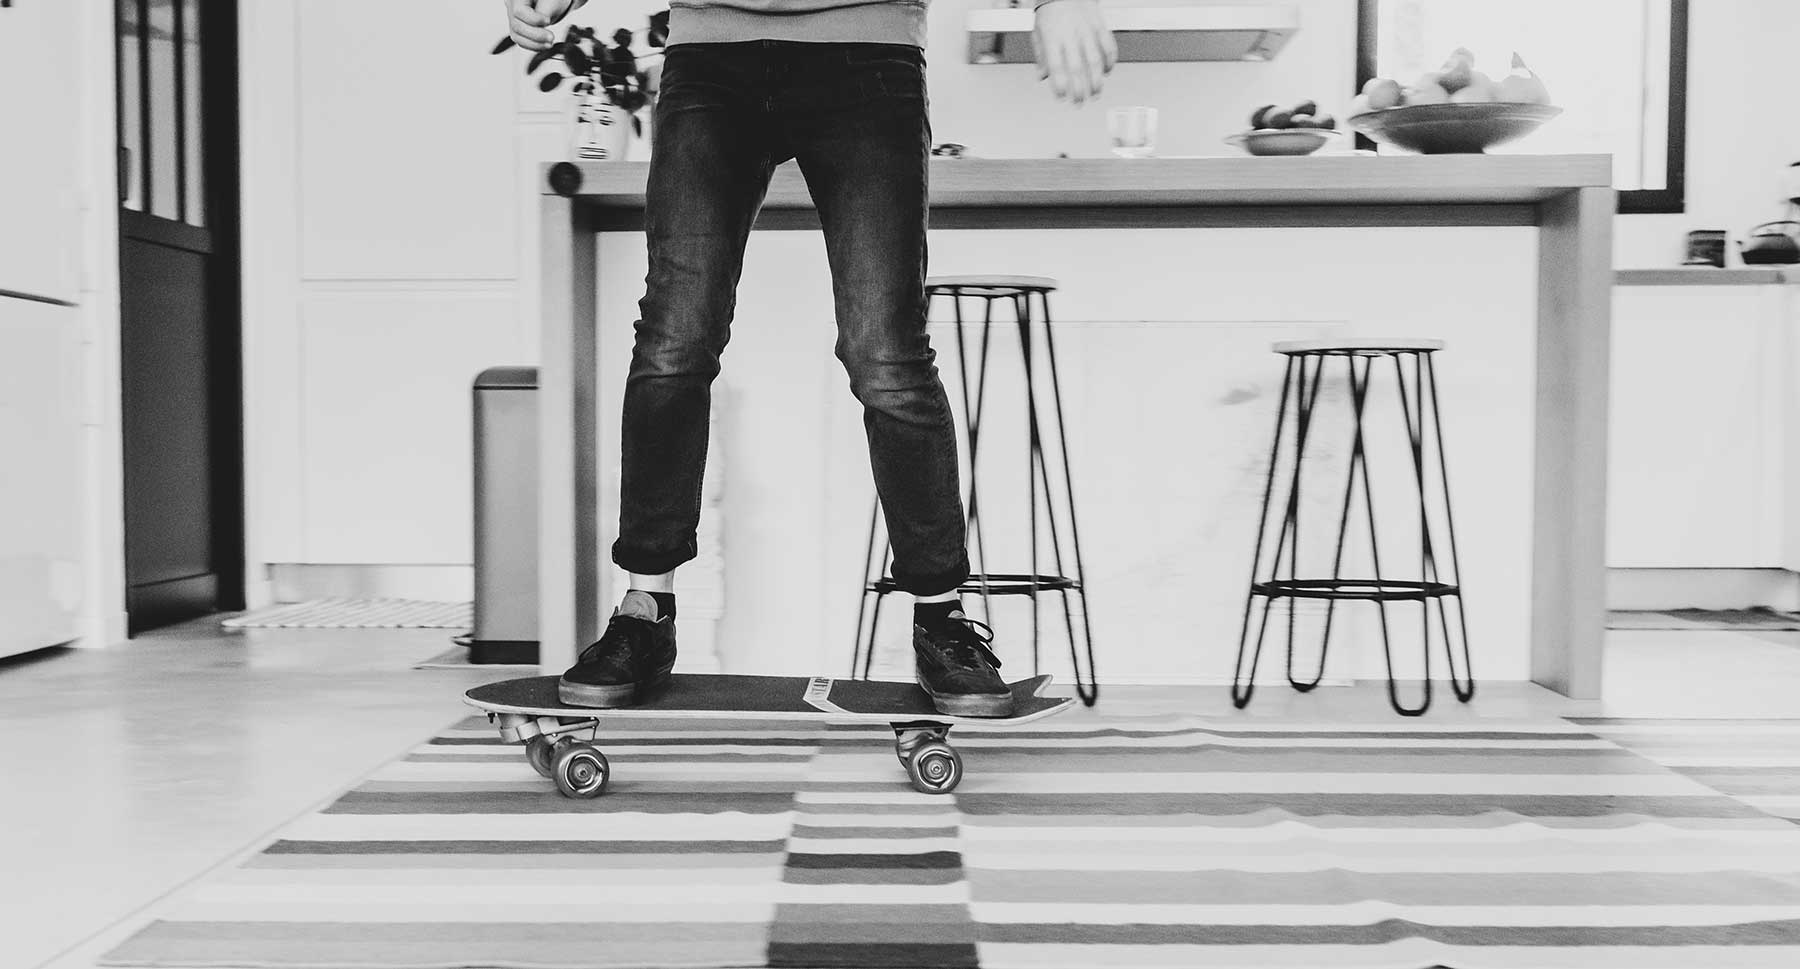 skate-photonb-nb-souston-landes-skate